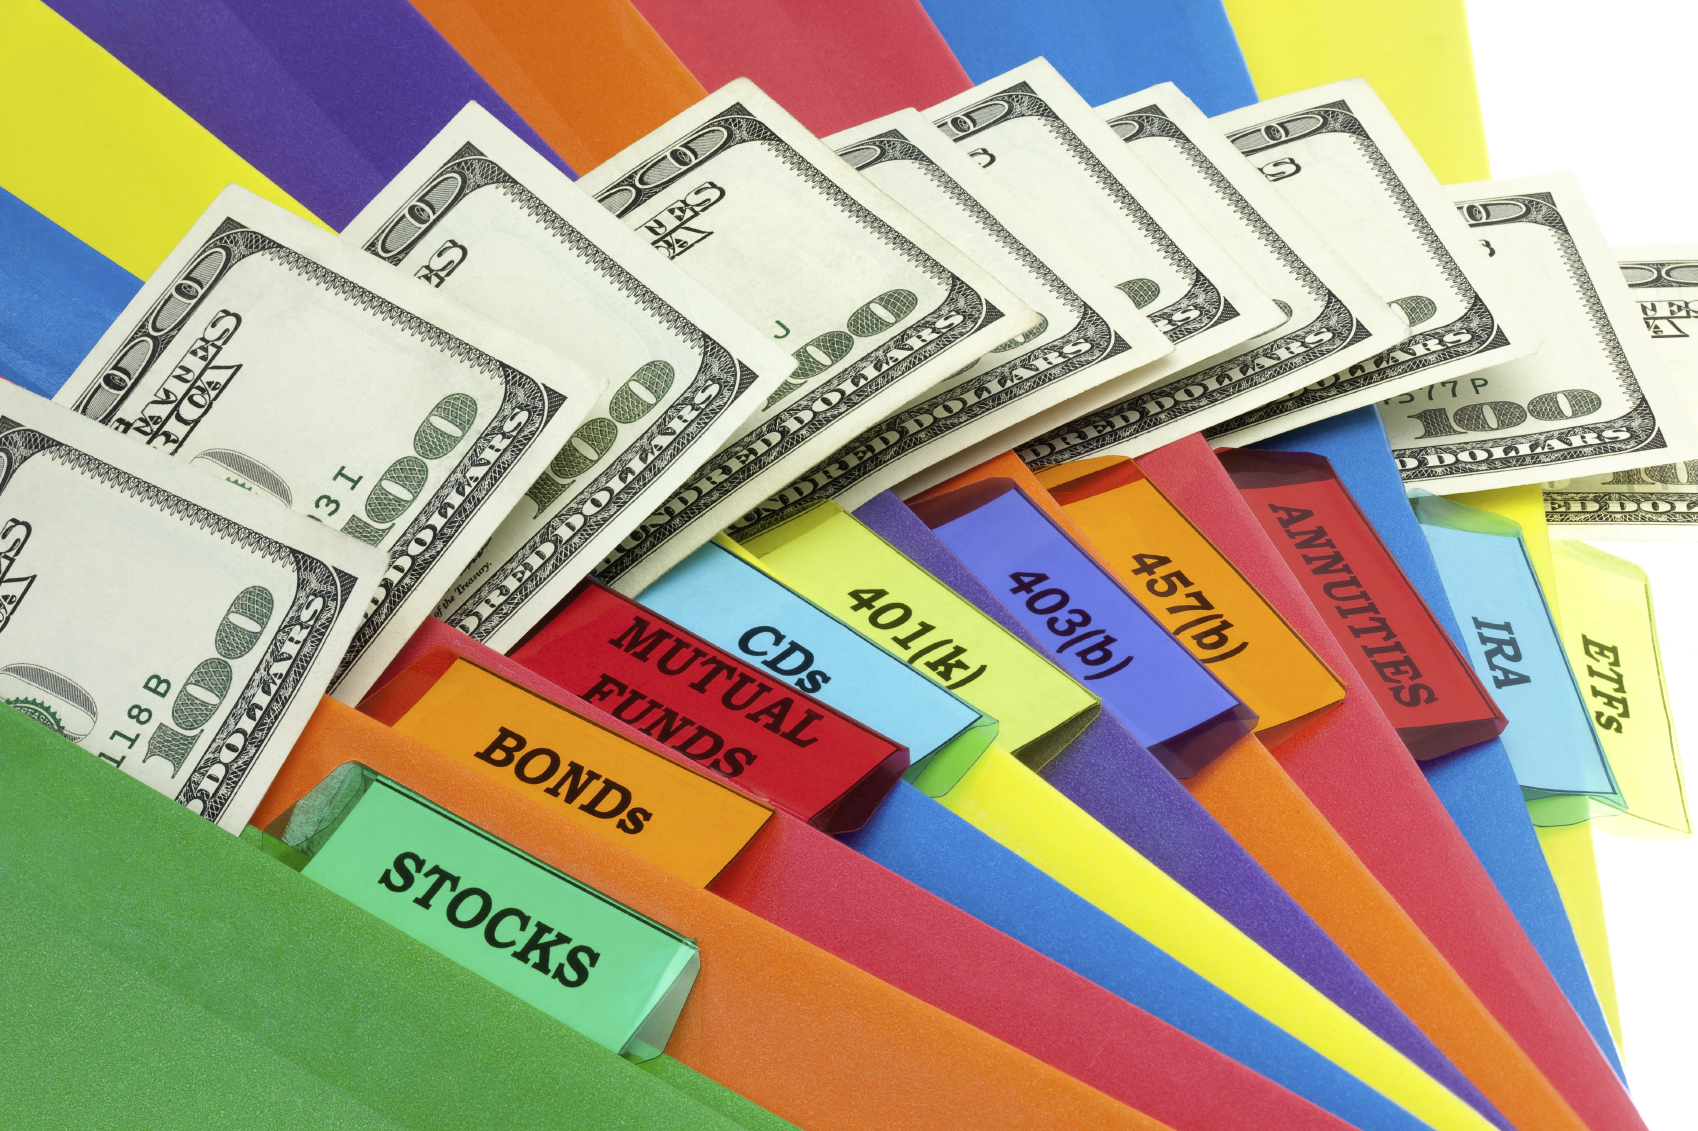 Investment securities bezdepozitni bonus forex 2013